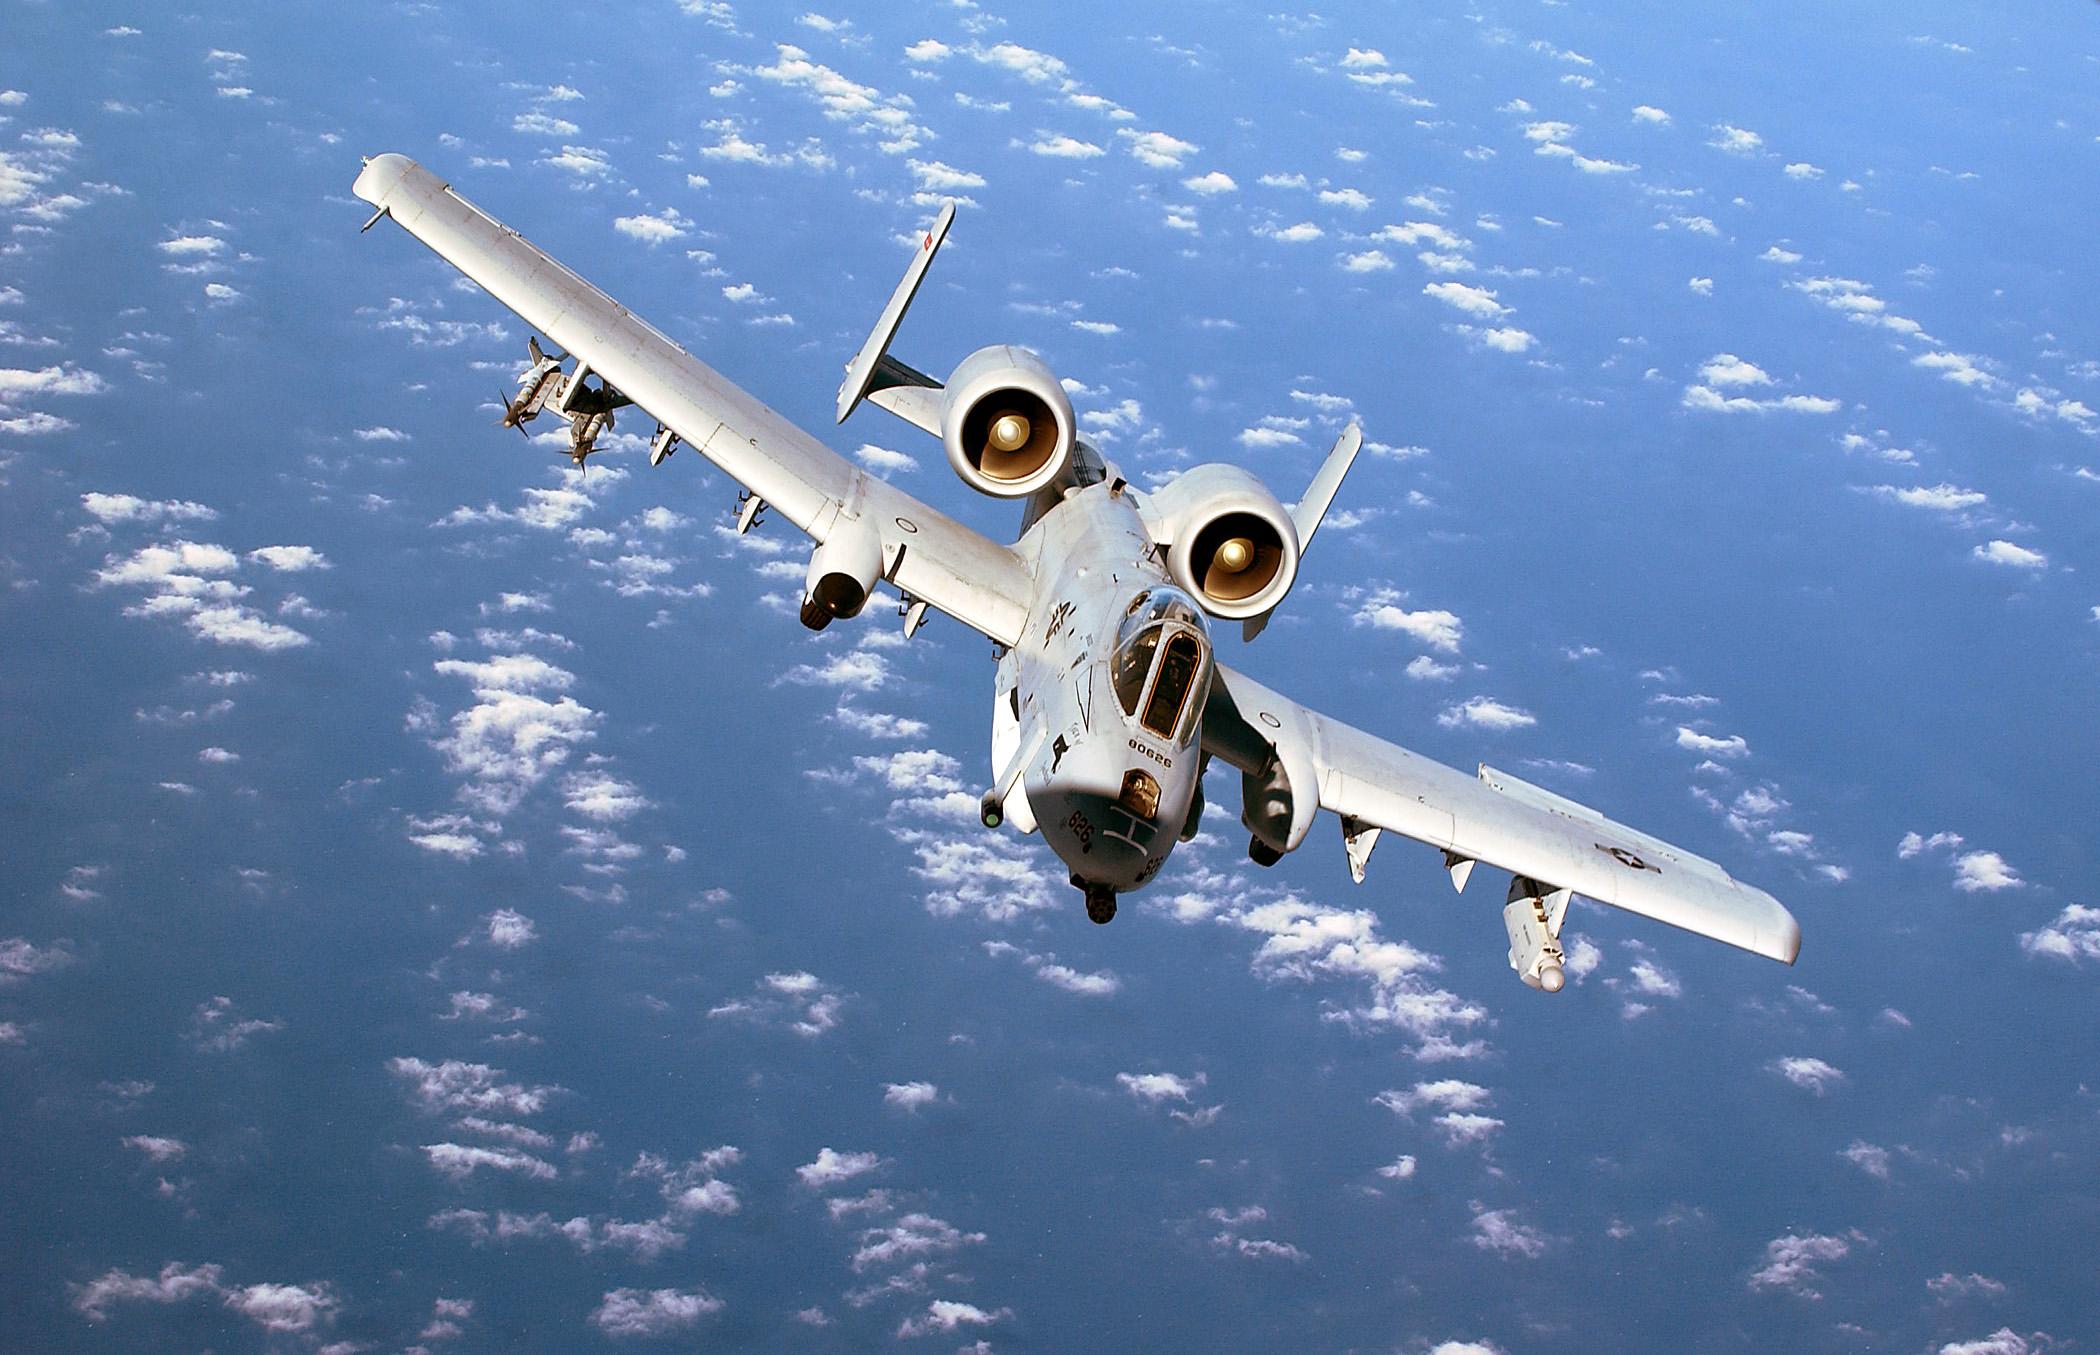 File:A-10 Thunderbolt II 1.jpg - Wikipedia